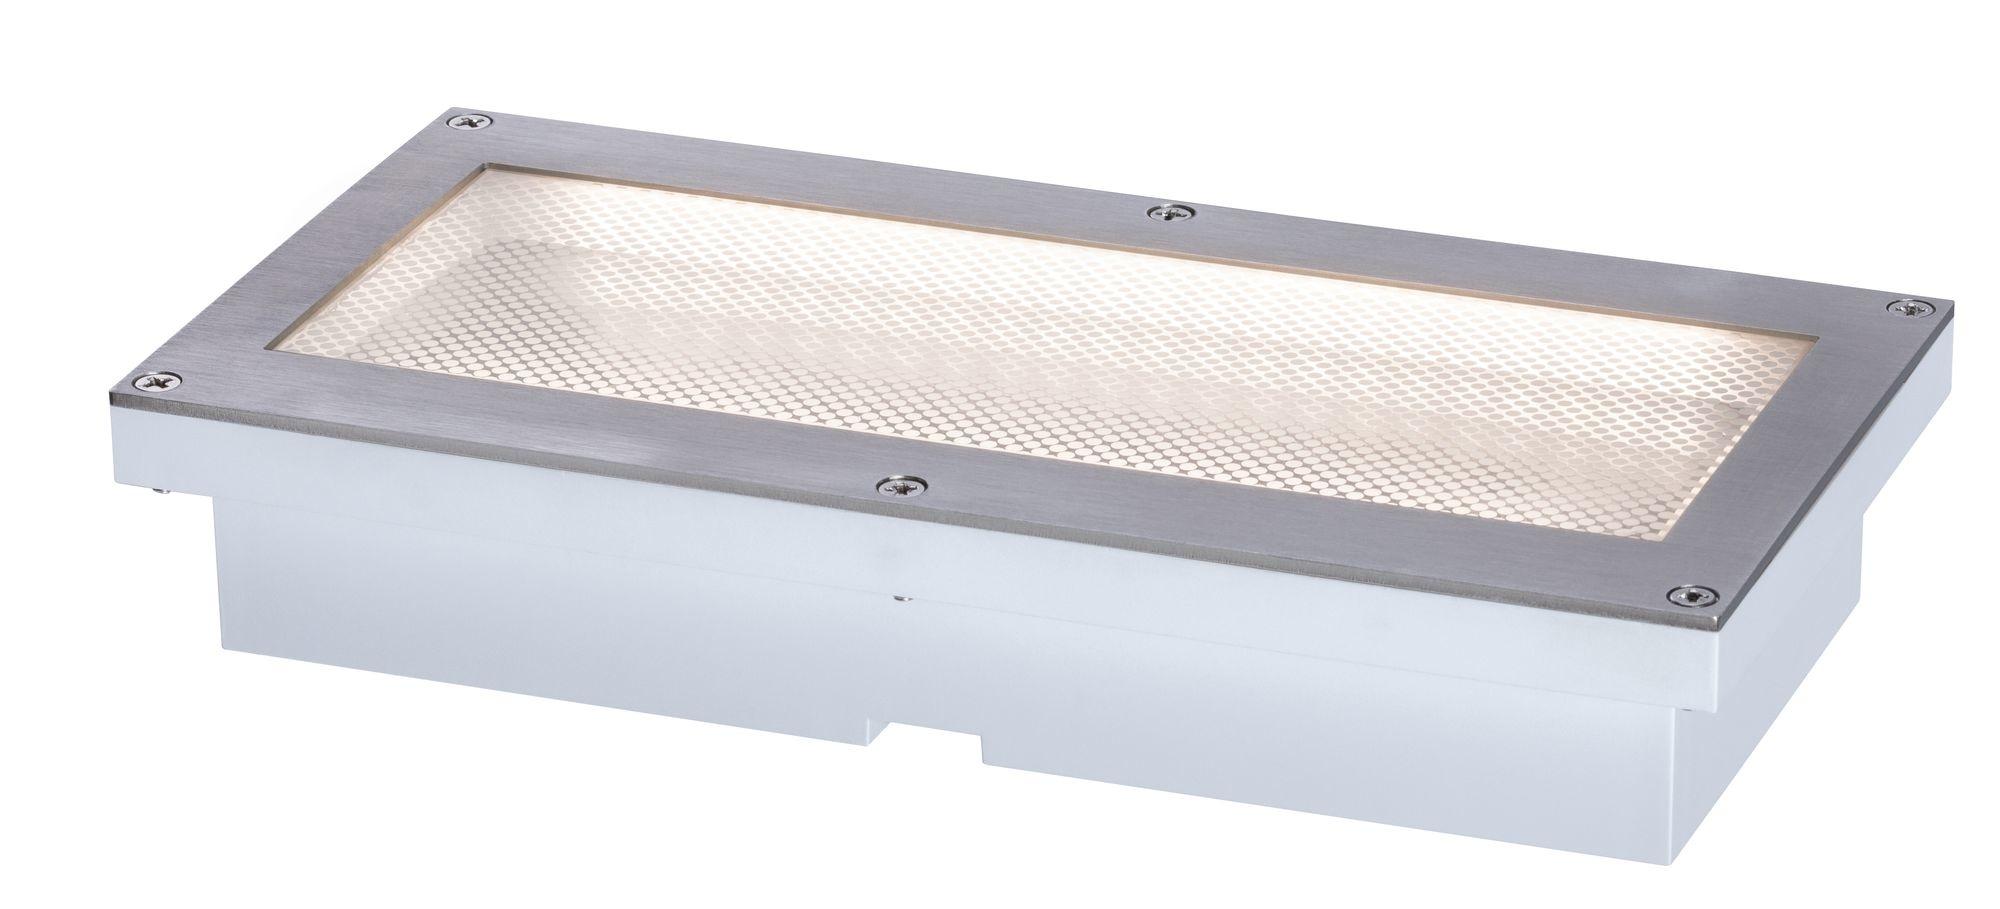 Paulmann Outdoor Solar BodenEBL Aron IP67 3000KMetall Bewegungsmelder 10/80lm 20*10cm